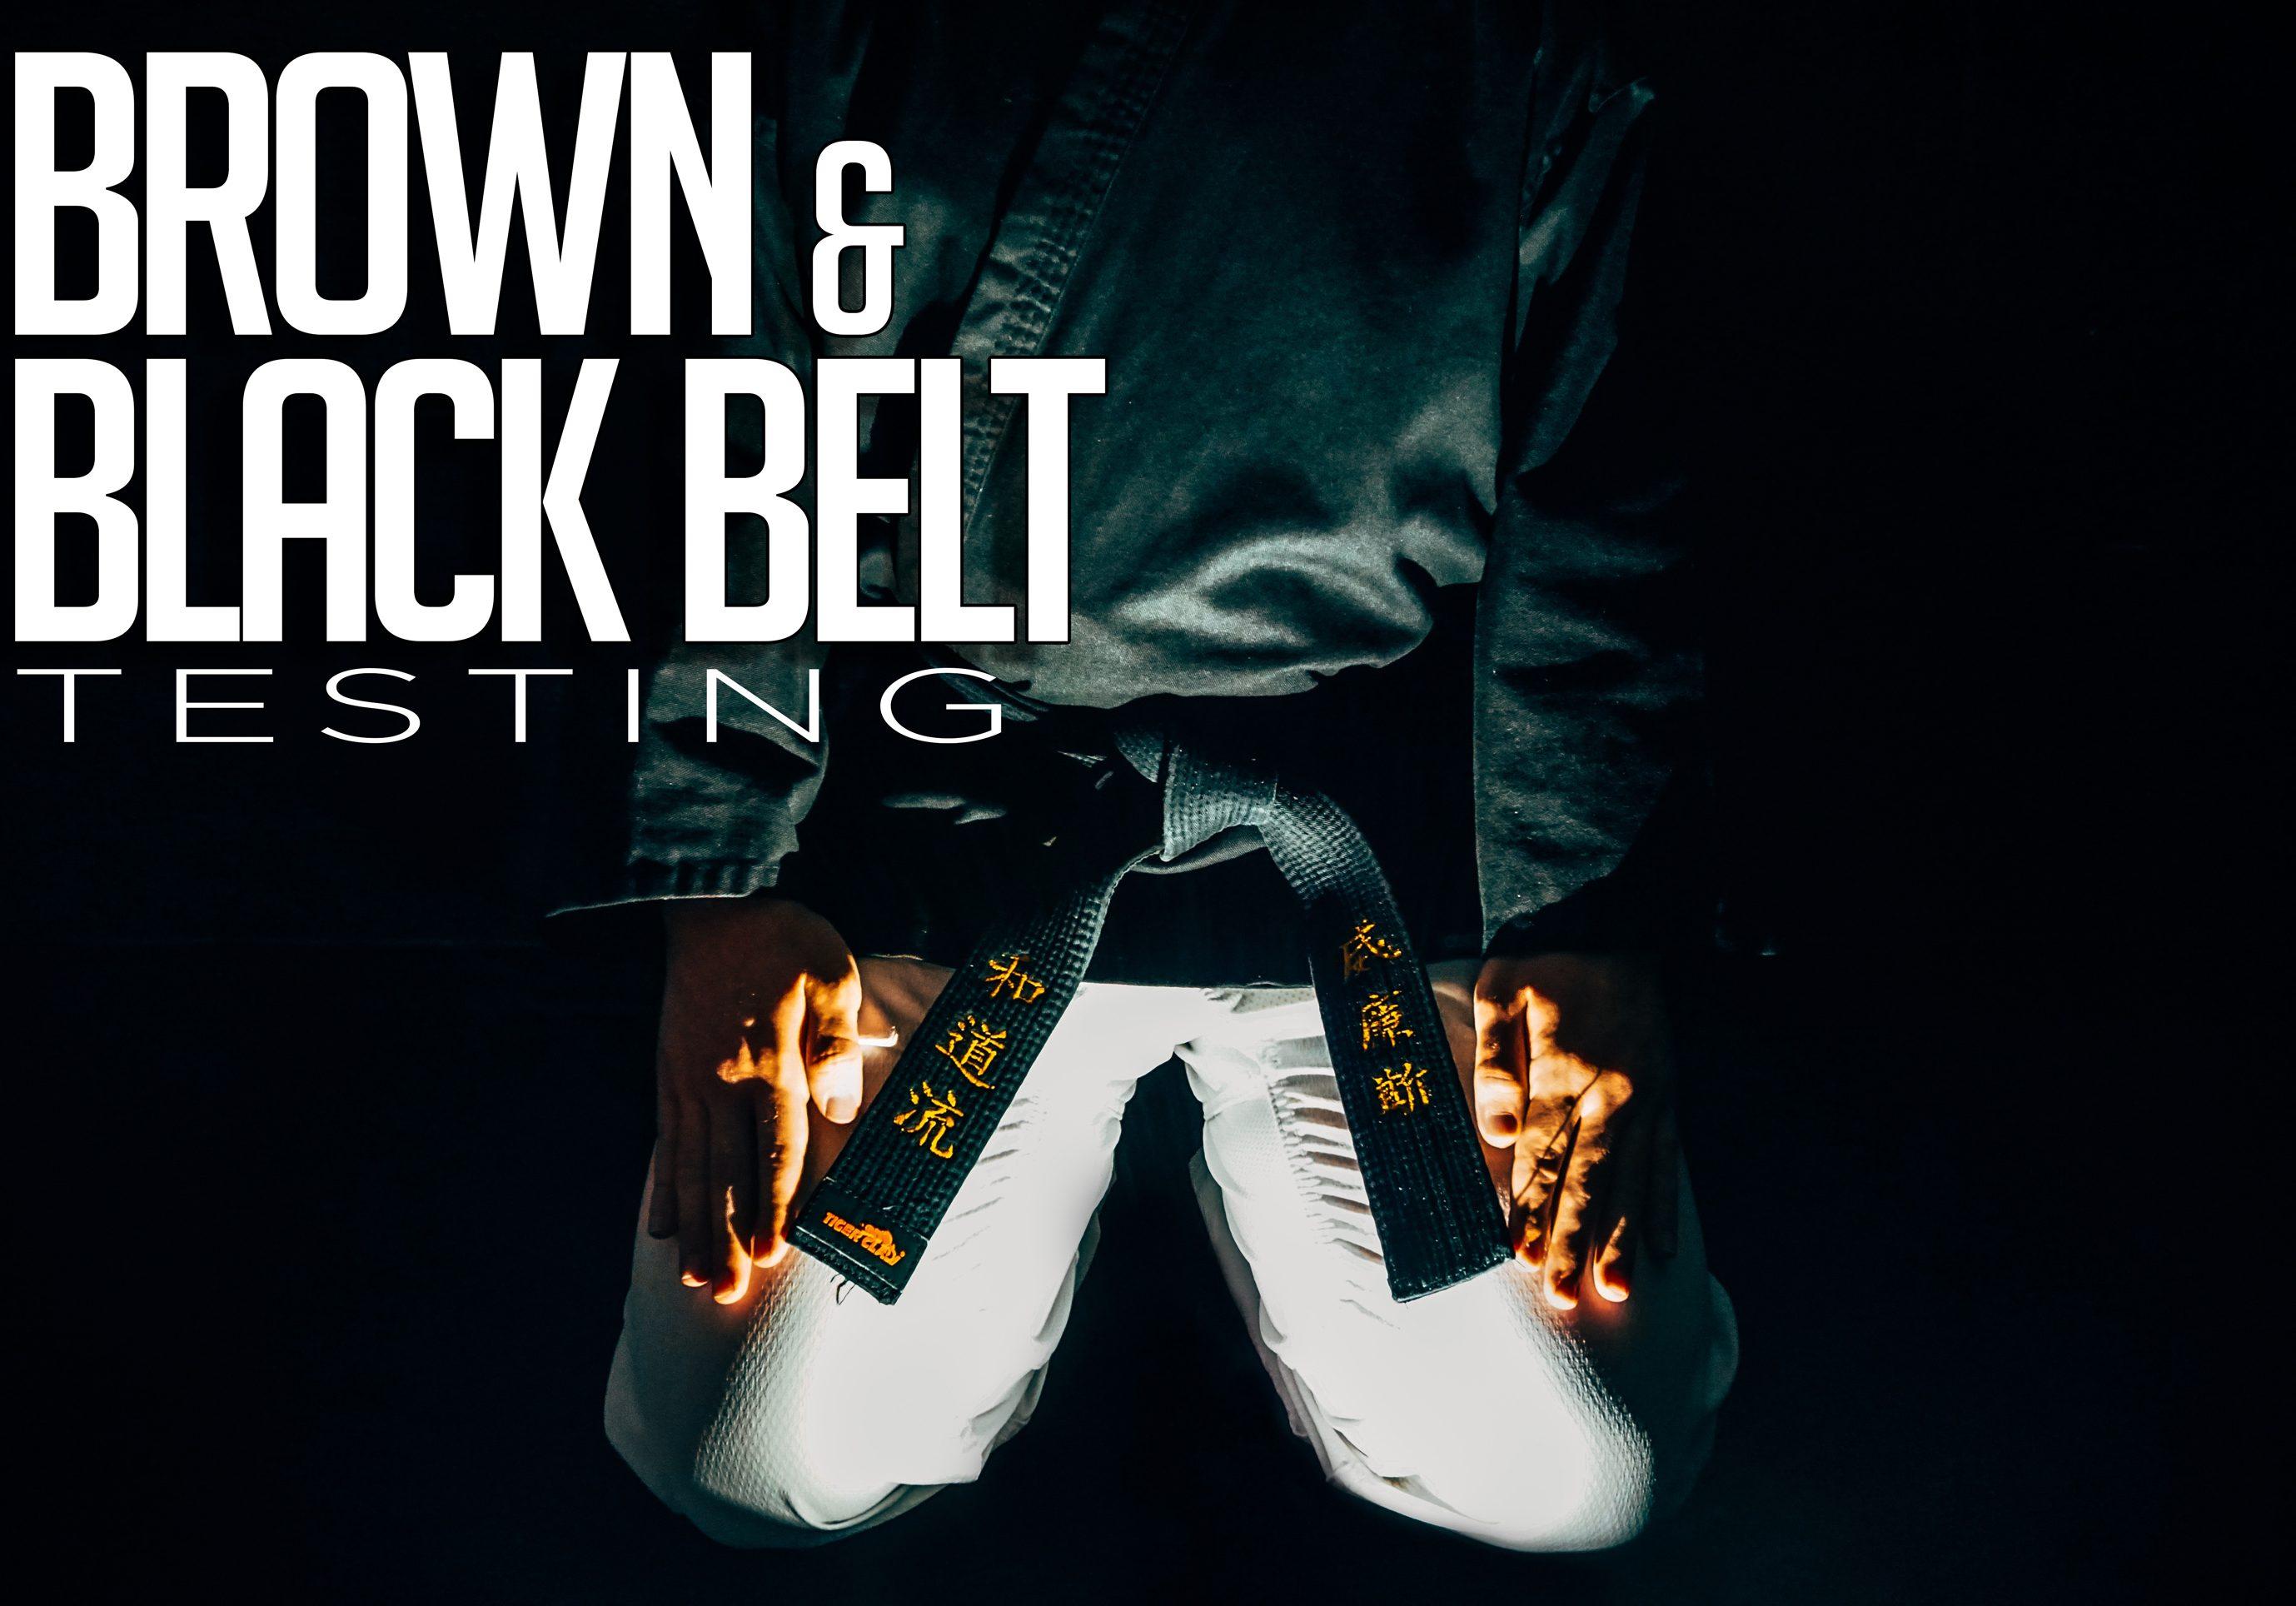 Brown & Black Belt Testing